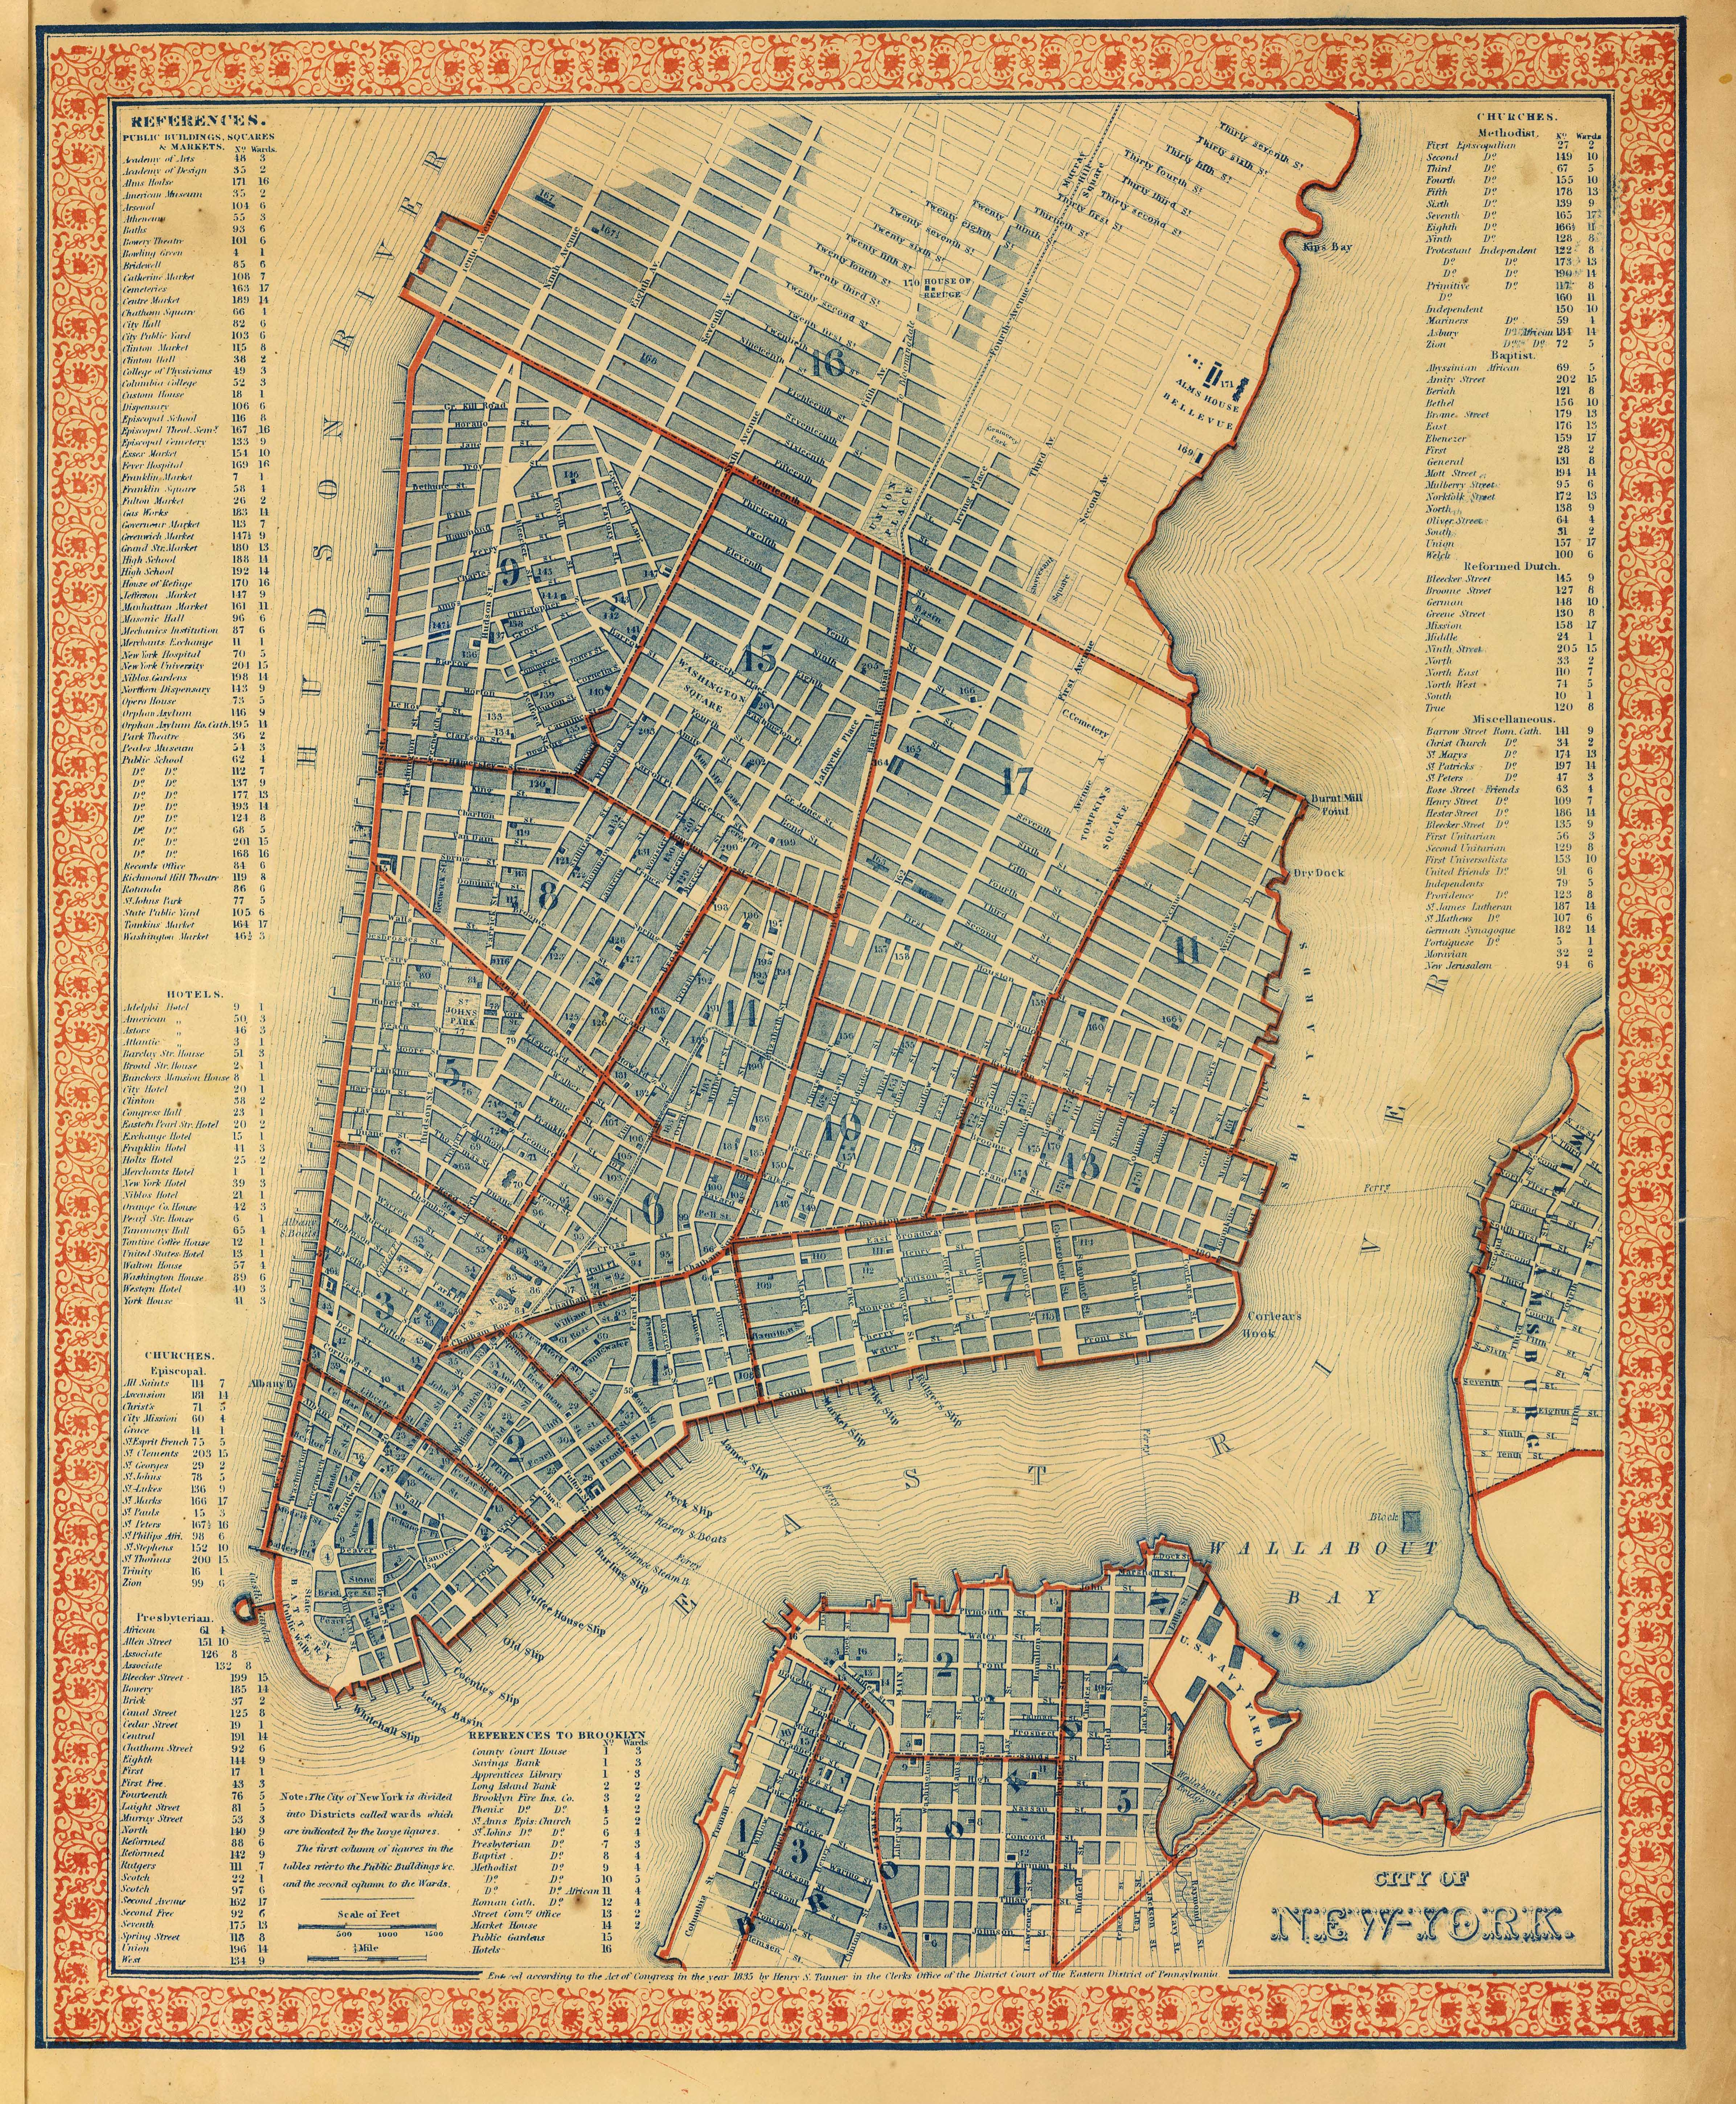 Description new york city 1846